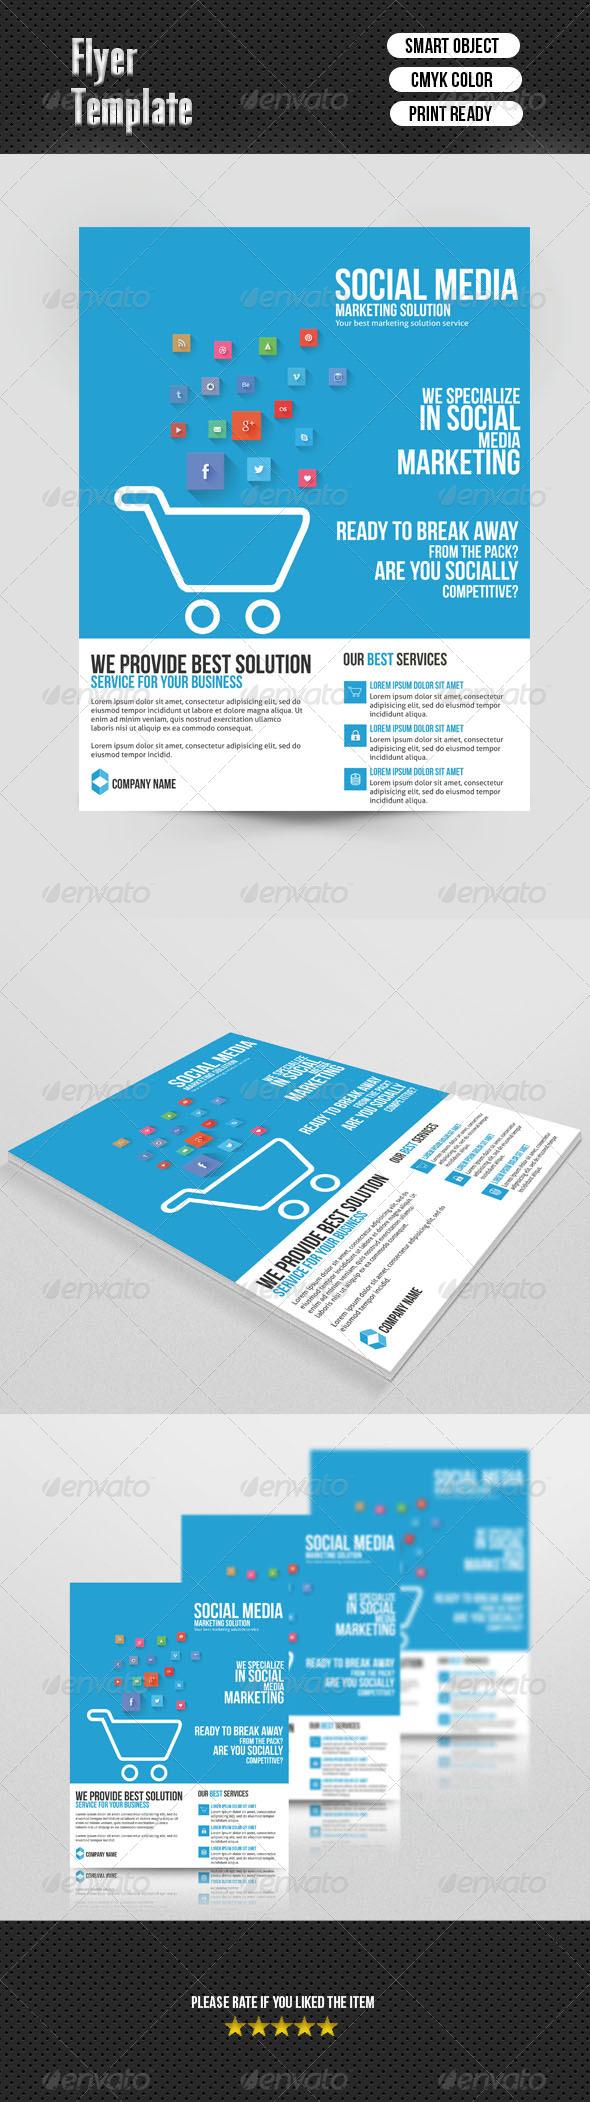 GraphicRiver Social Media Marketing Flyer 6964847